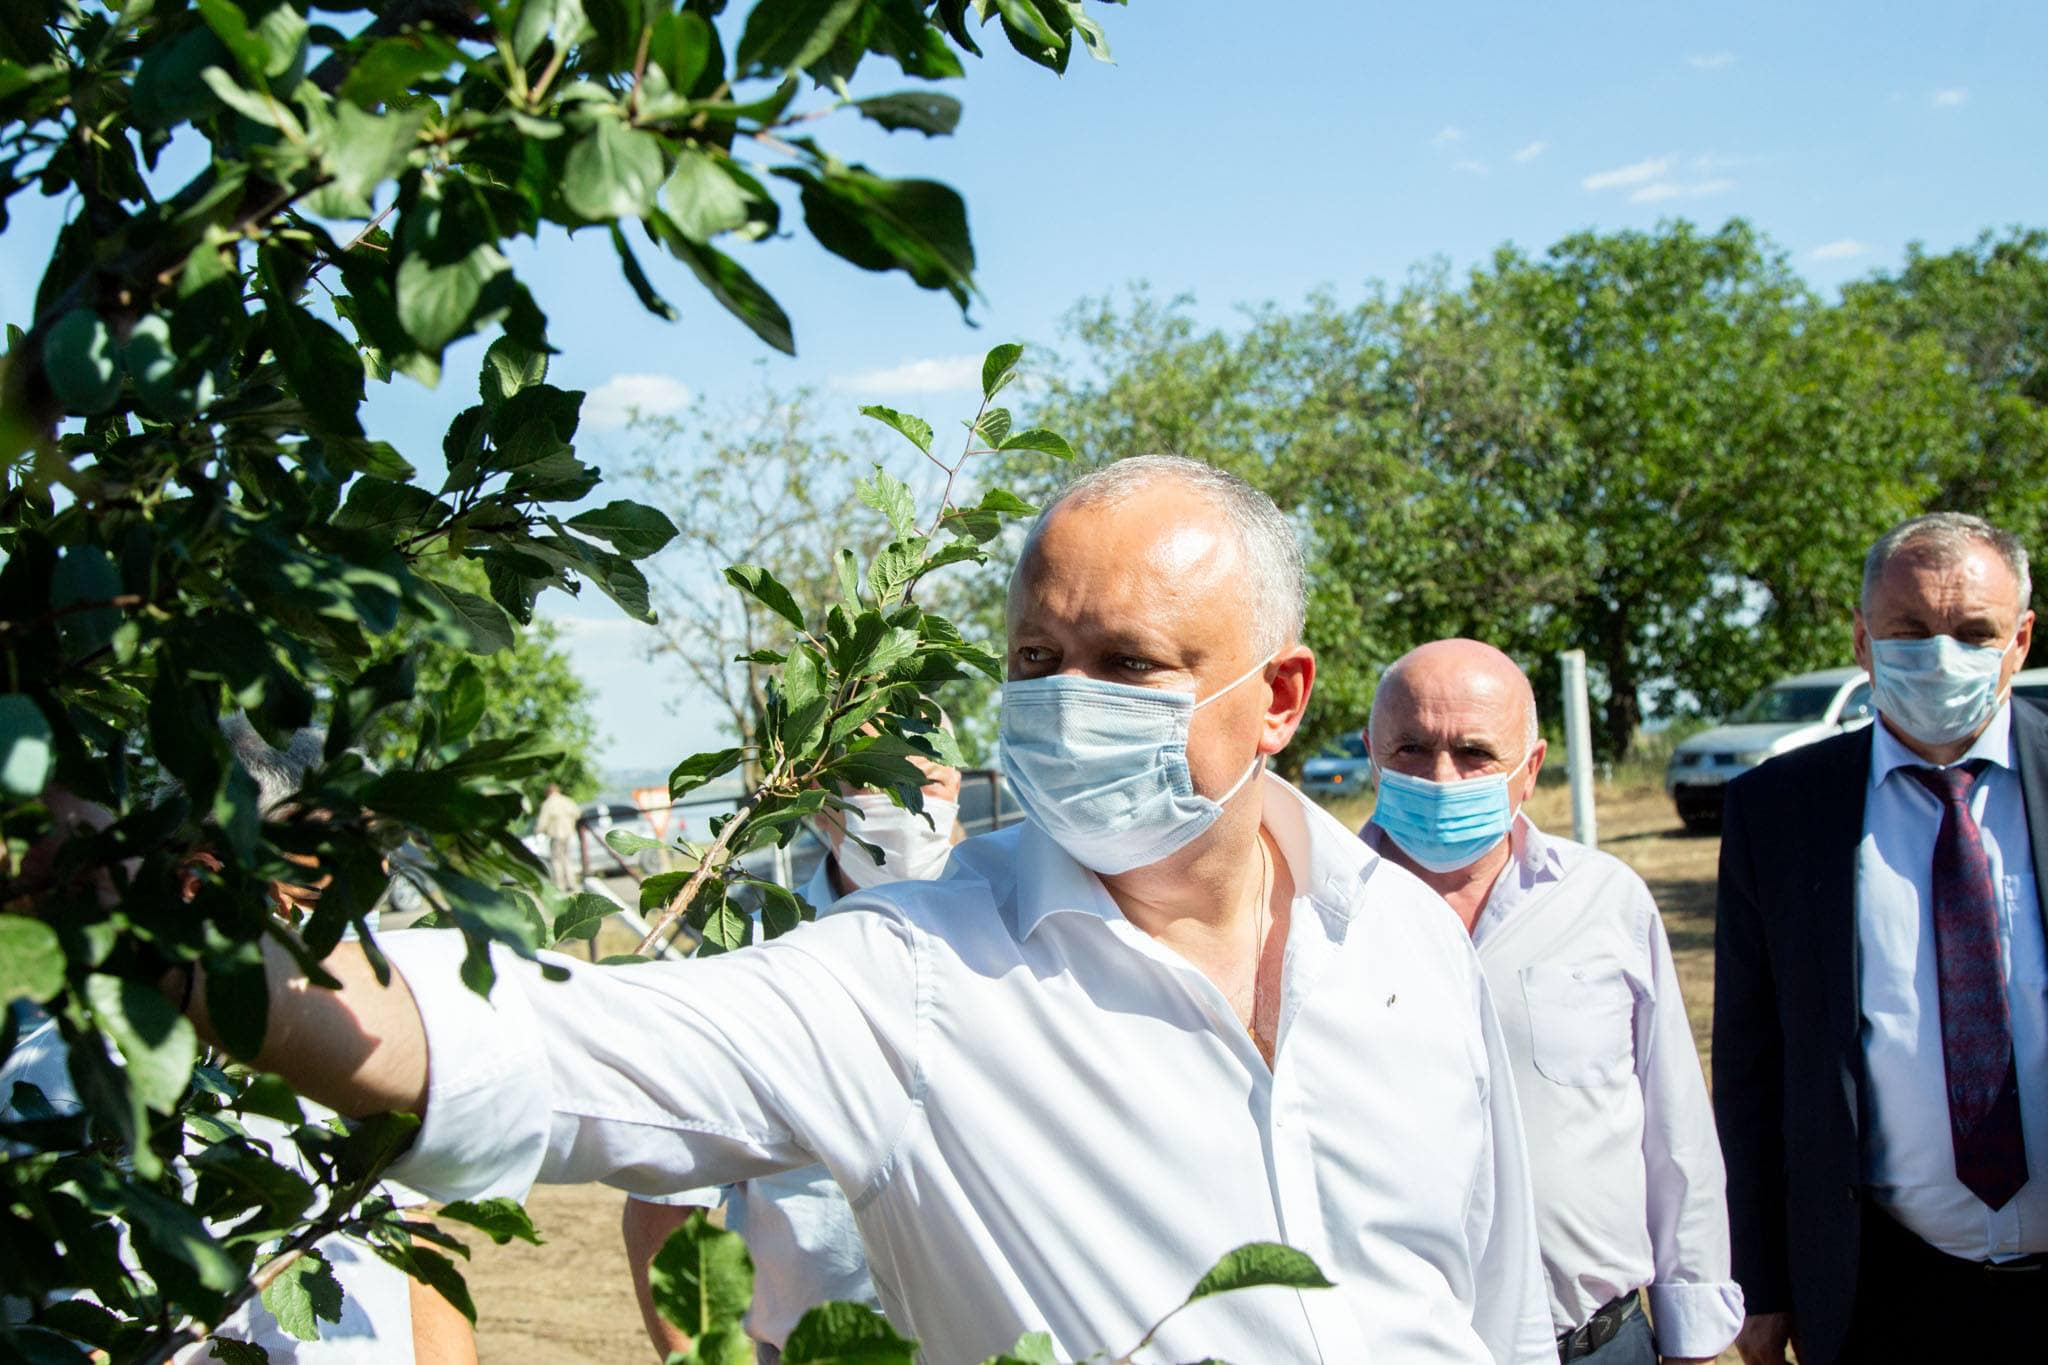 Глава государства поблагодарил аграриев за усердный труд (ФОТО, ВИДЕО)